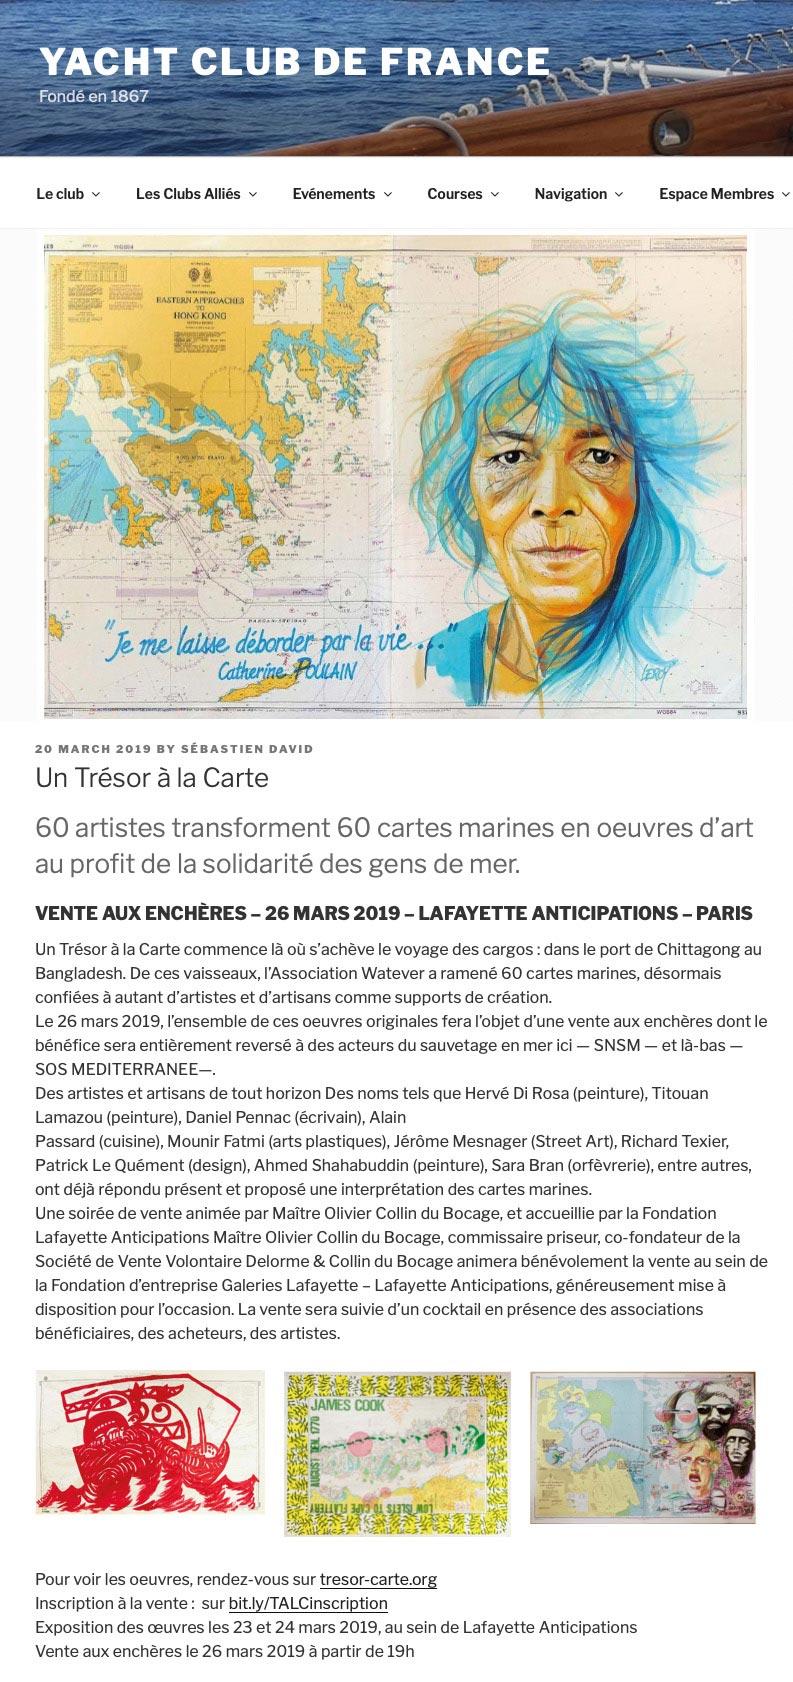 Yacht Club De France - Christian LEROY - Vente caritative Watever